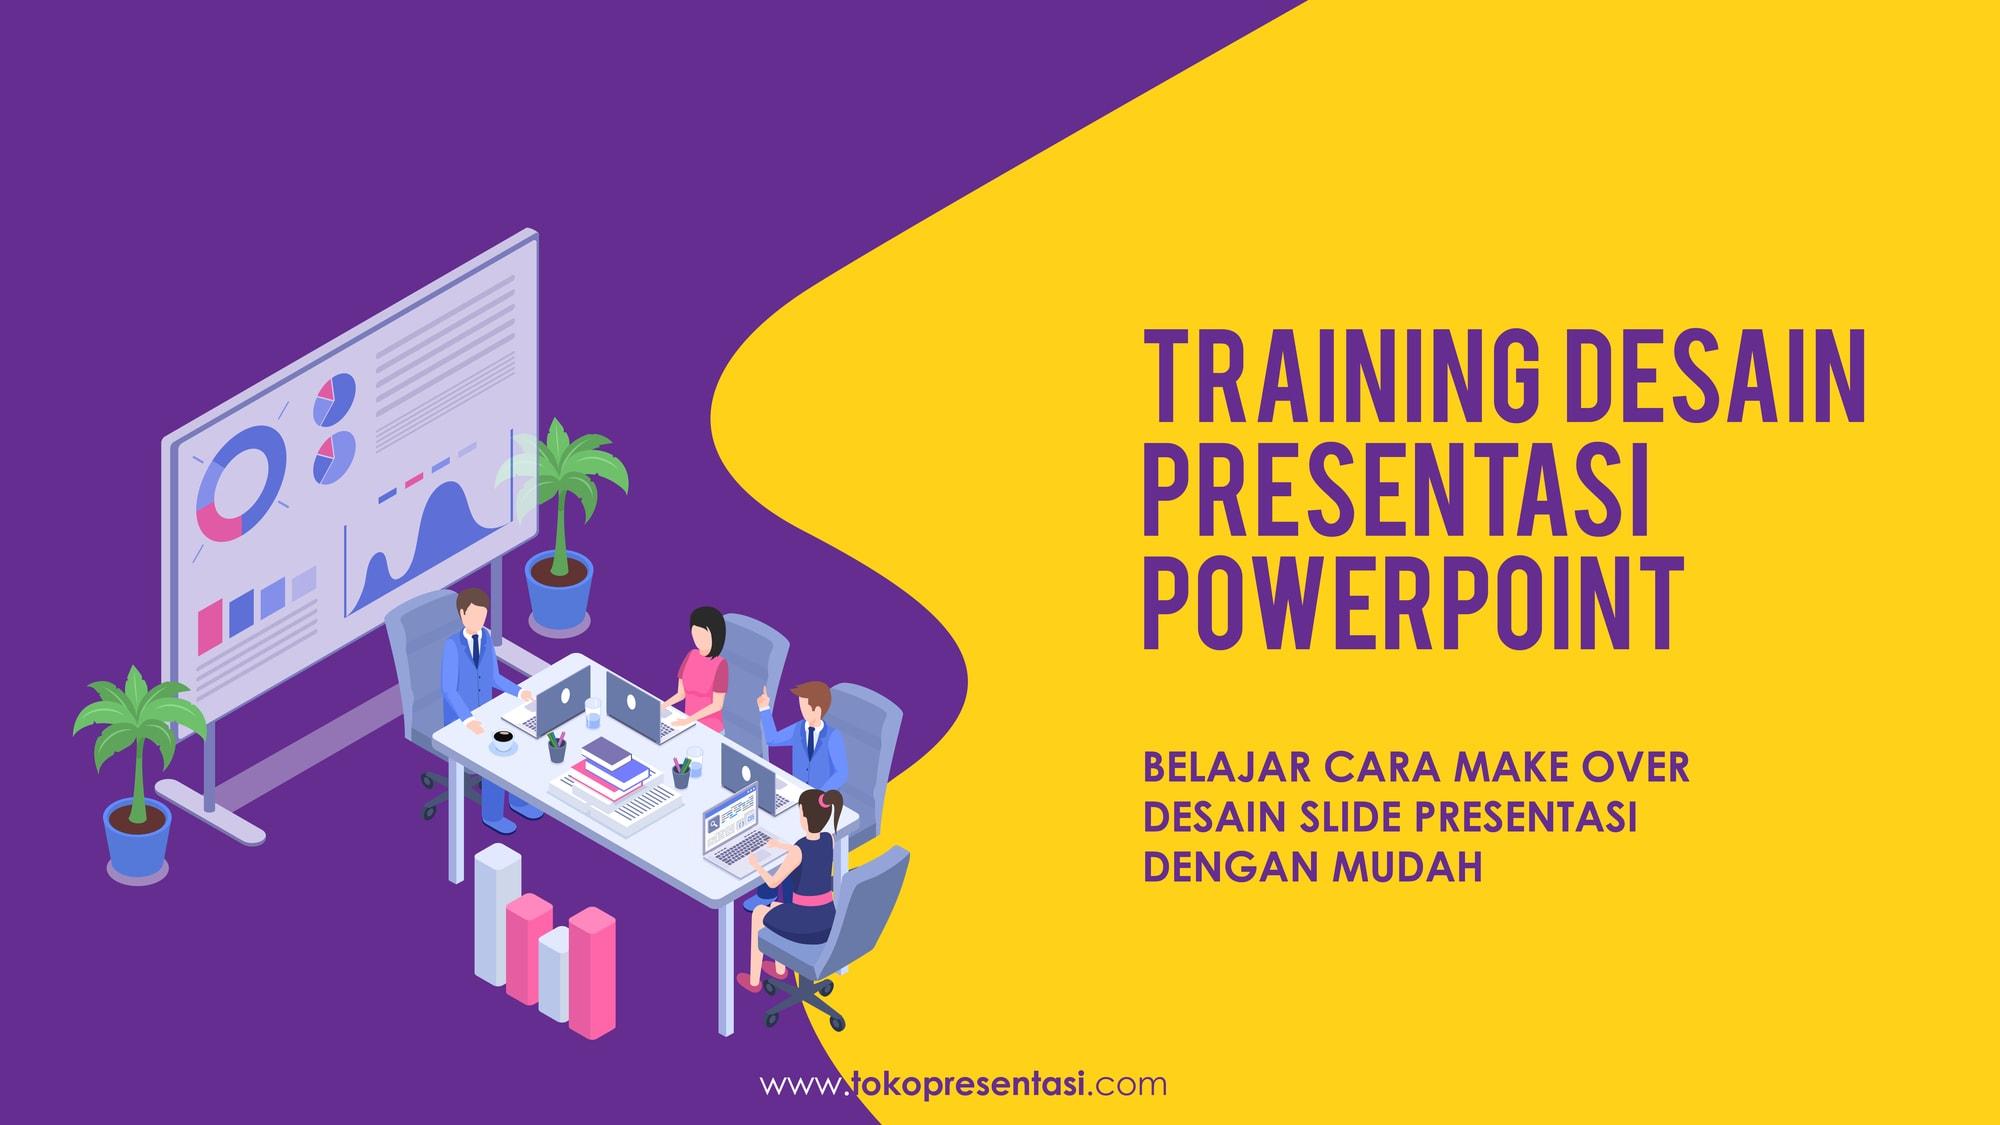 Pelatihan Desain Presentasi PowerPoint Majelis Permusyawaratan Rakyat Tokopresentasi